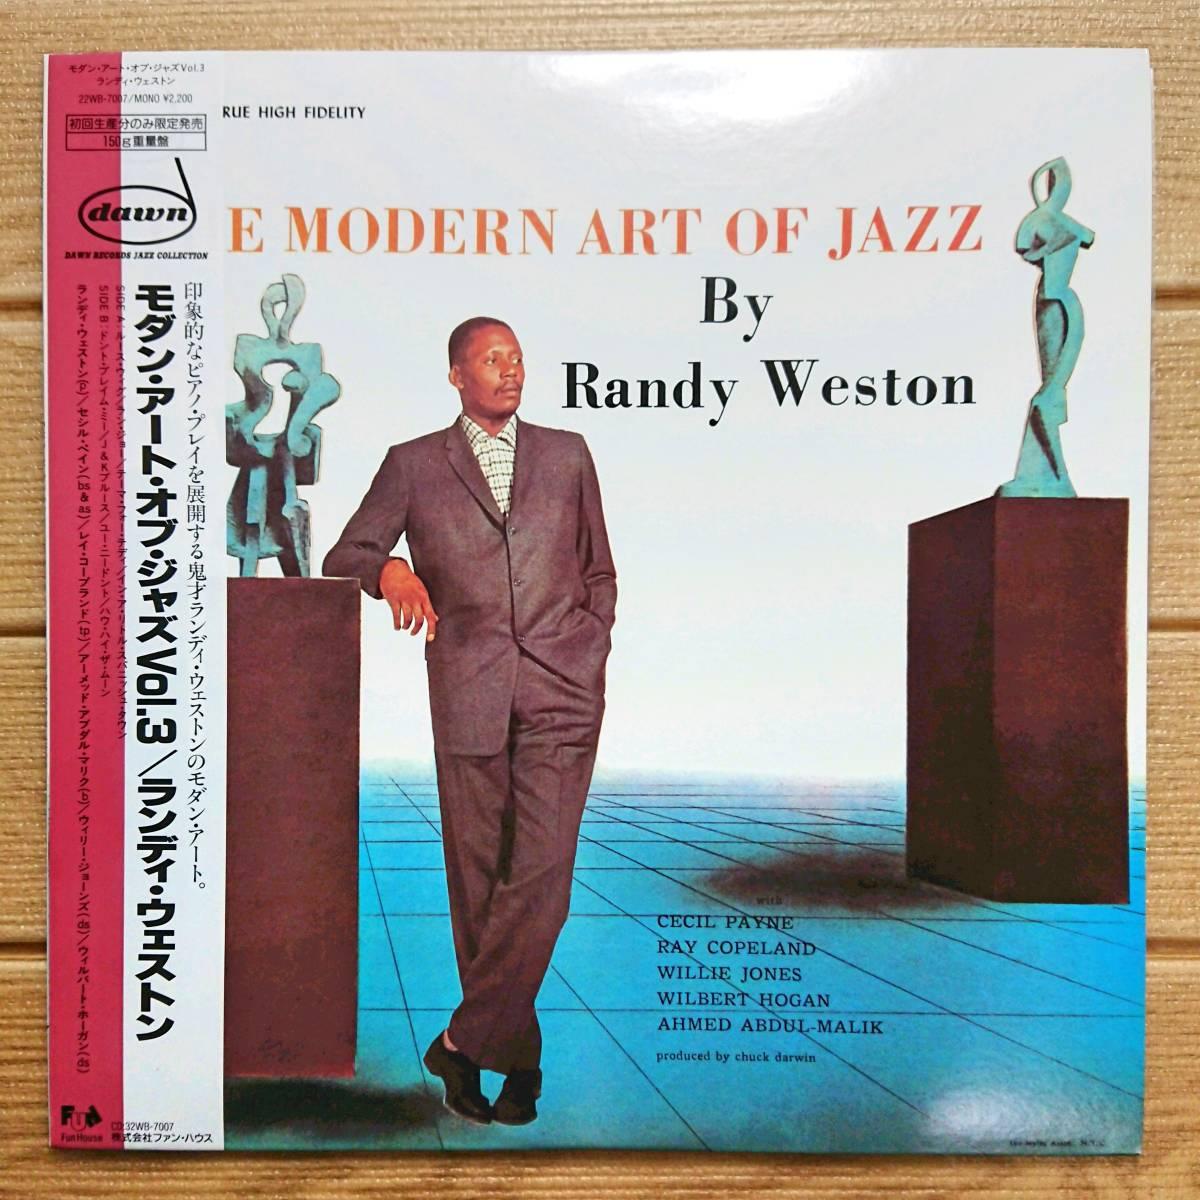 Randy Weston(p)/The Modern Art Of Jazz Vol.3 ランディ・ウエストン(p)/モダン・アート・オブ・ジャズ Vol.3【国内帯付重量盤美盤】_画像1